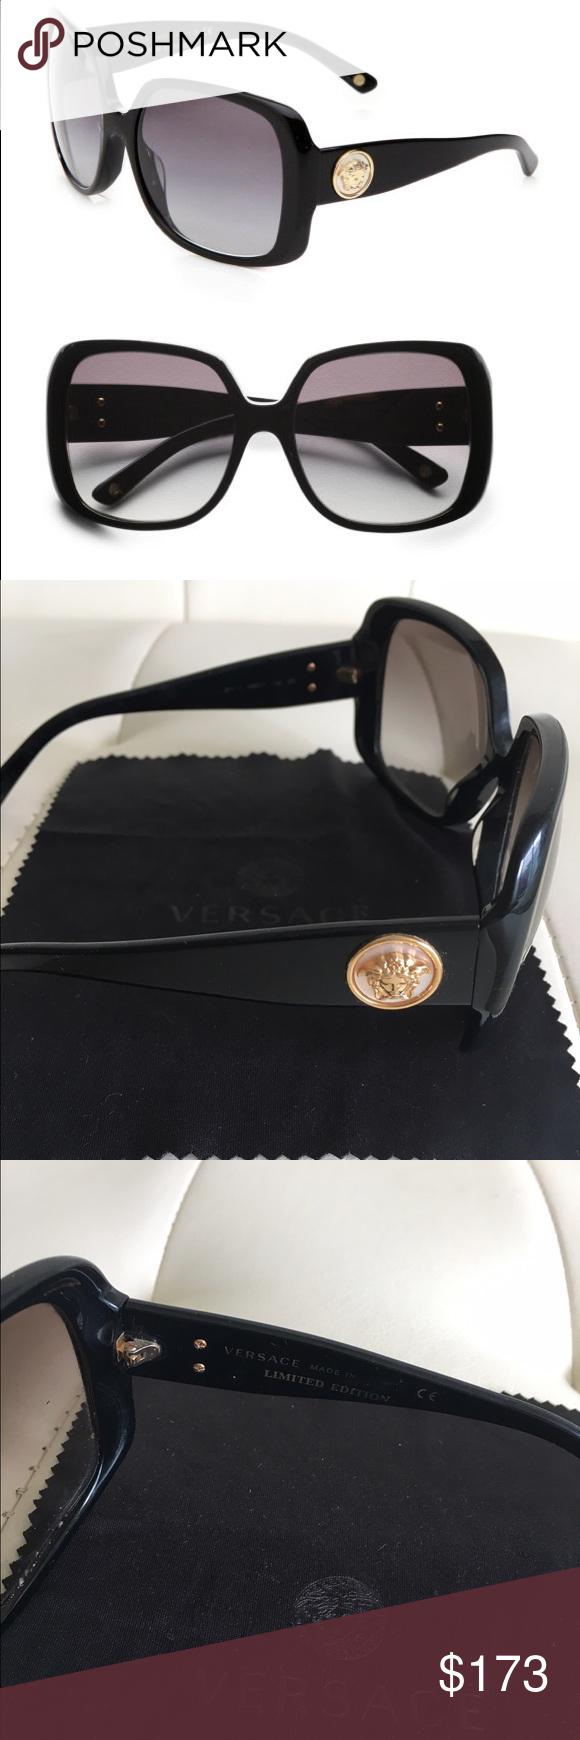 e17c80392390 Versace sunglasses Limited Edition VERSACE Sunglasses/Versace Limited  Edition Oversized Square Sunglasses/Womens Black Gradient Versace  Accessories ...